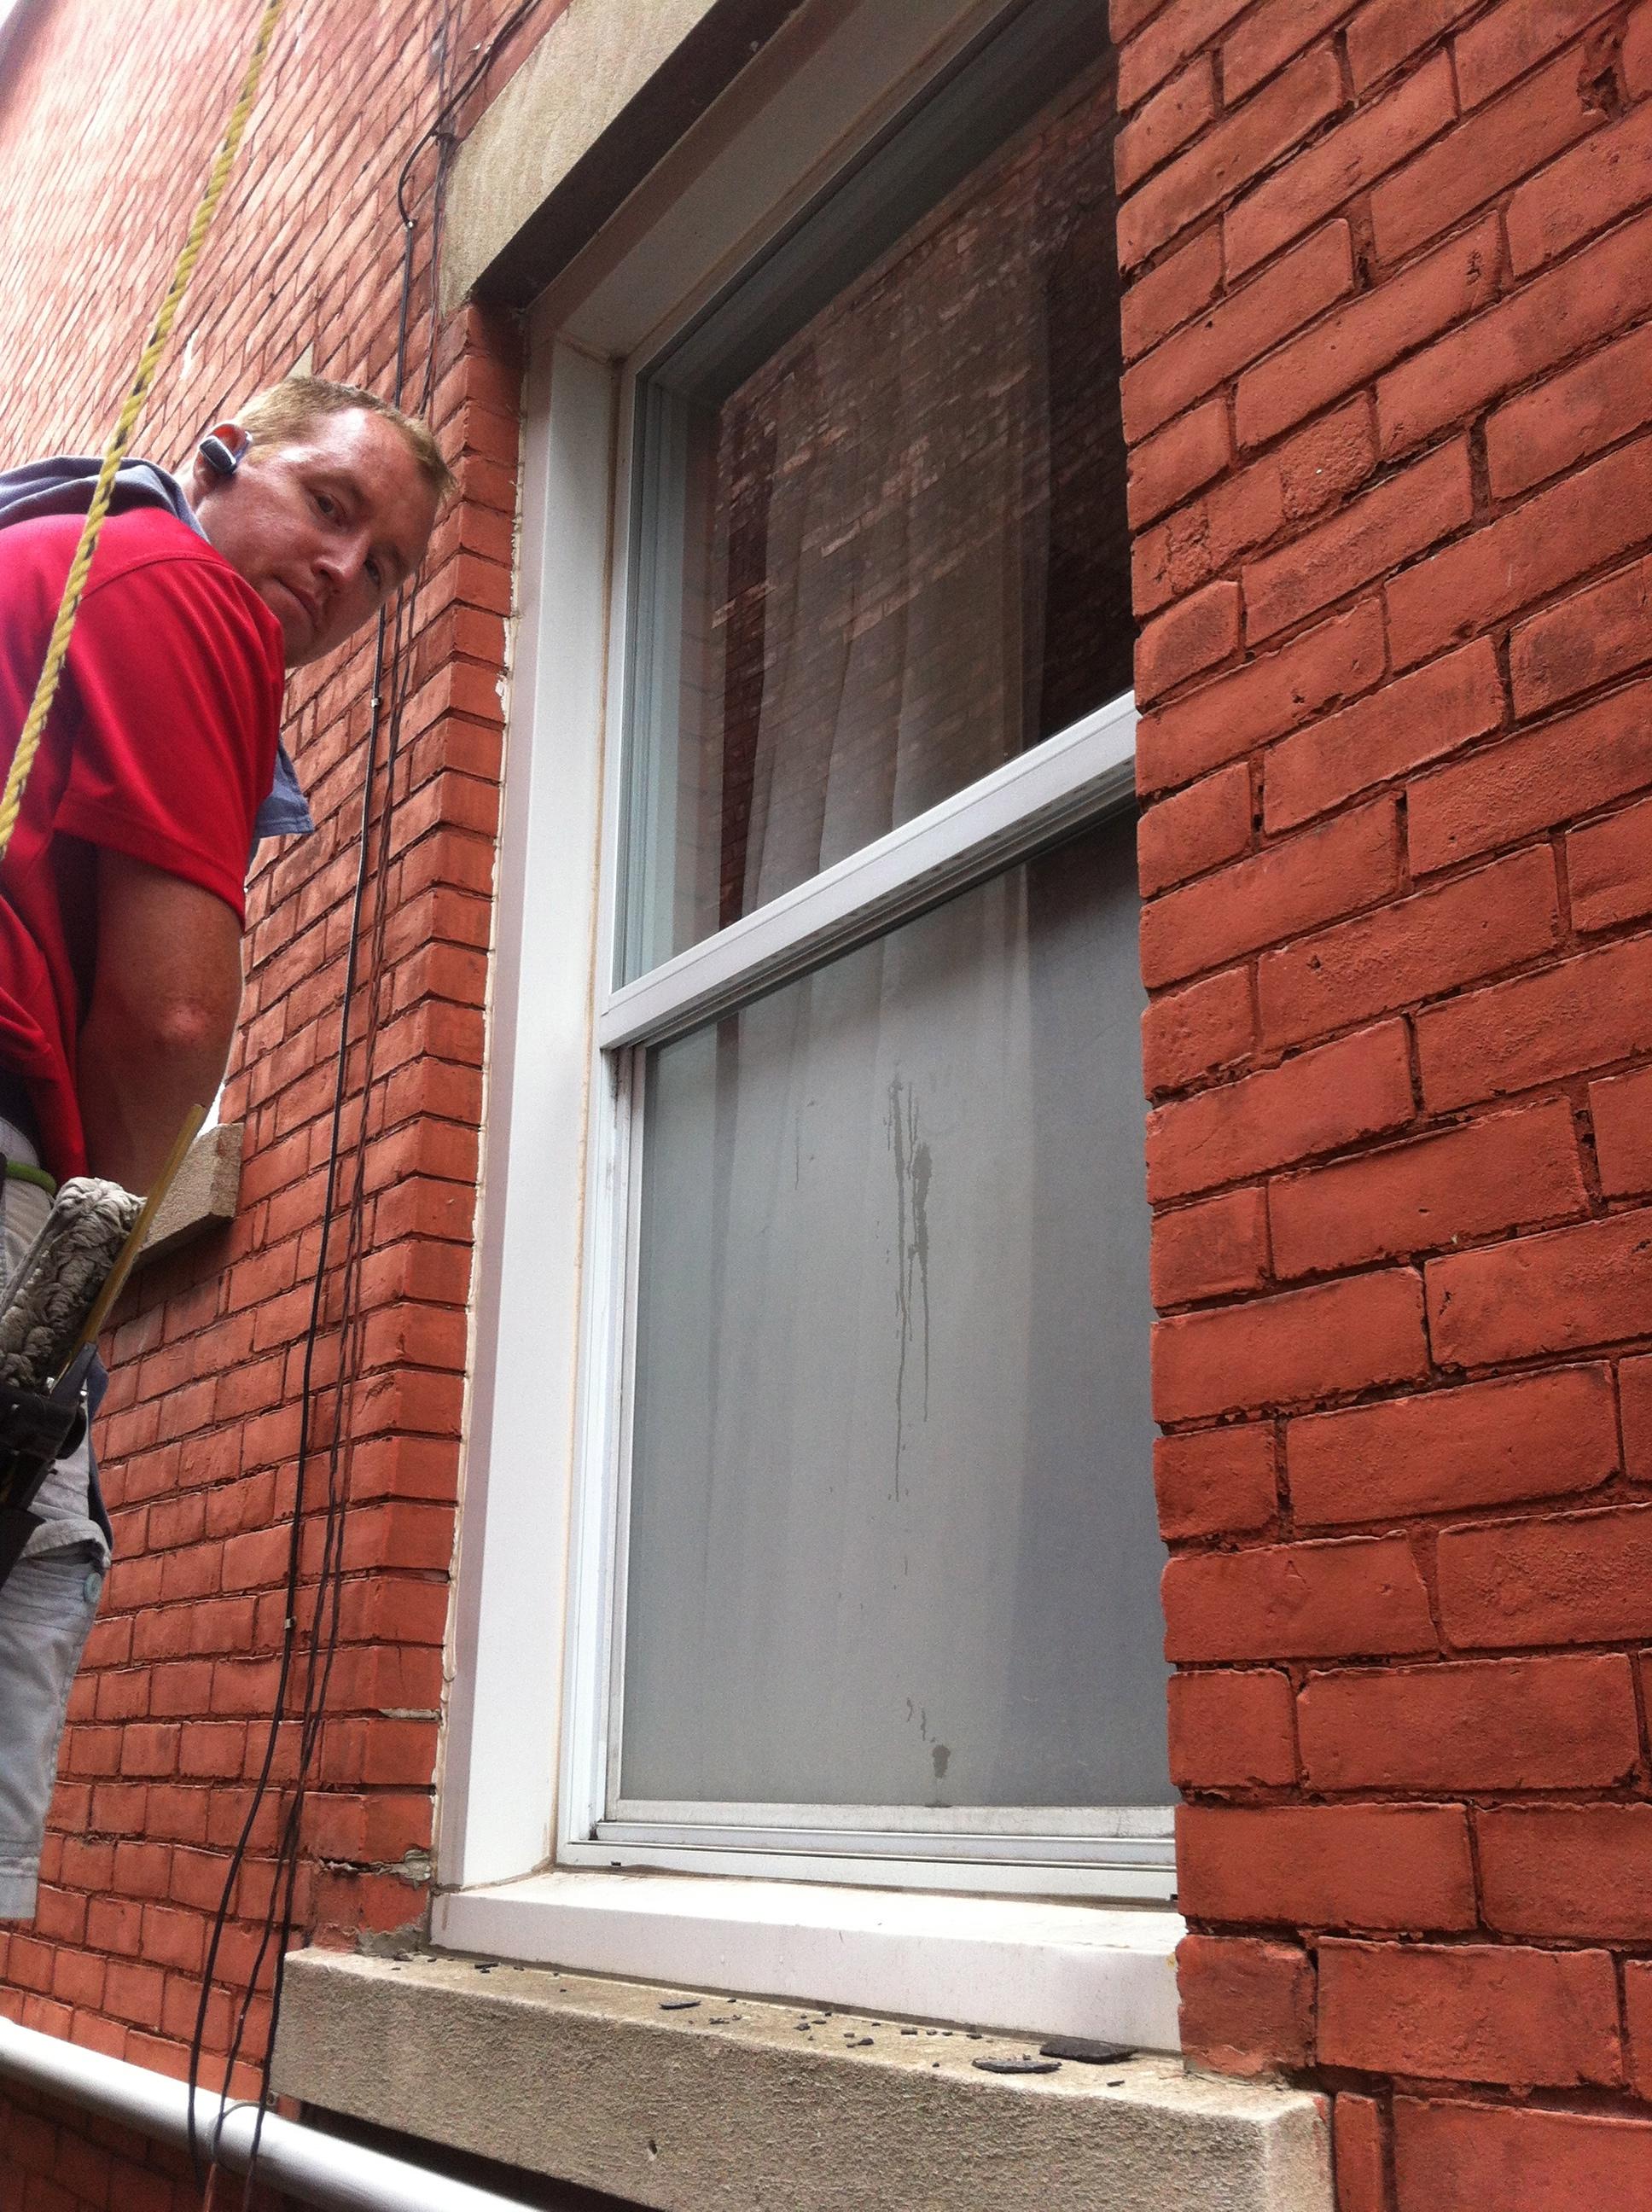 Kelly window cleaning